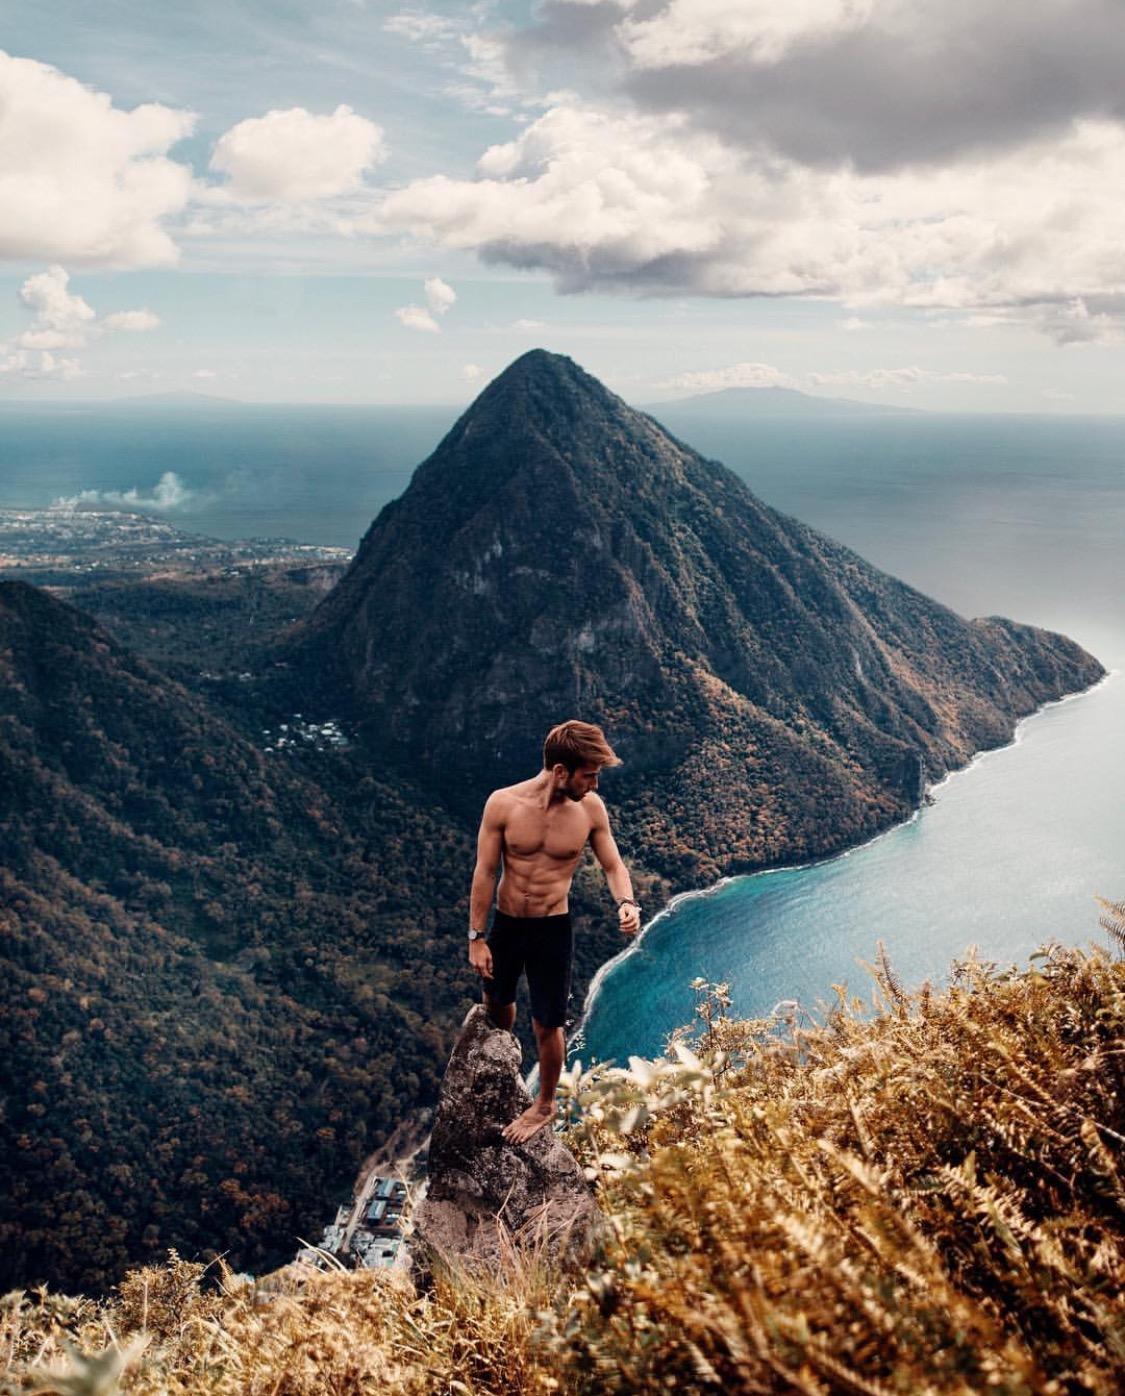 Sam Kolder jumps off a cliff in furore